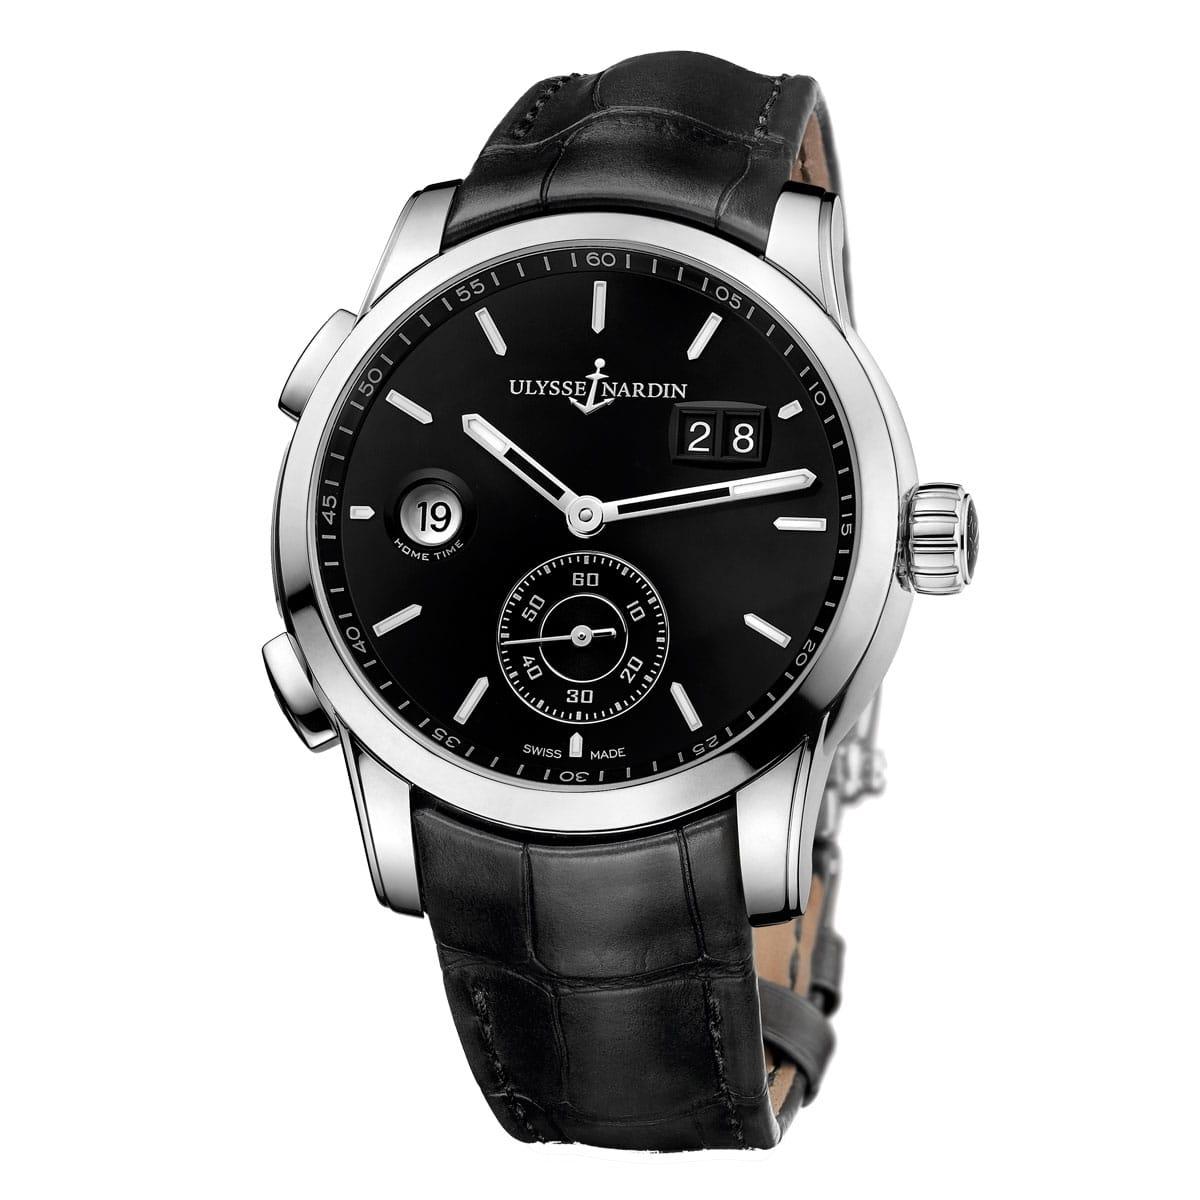 Ulysse Nardin - Dual Time Manufacture